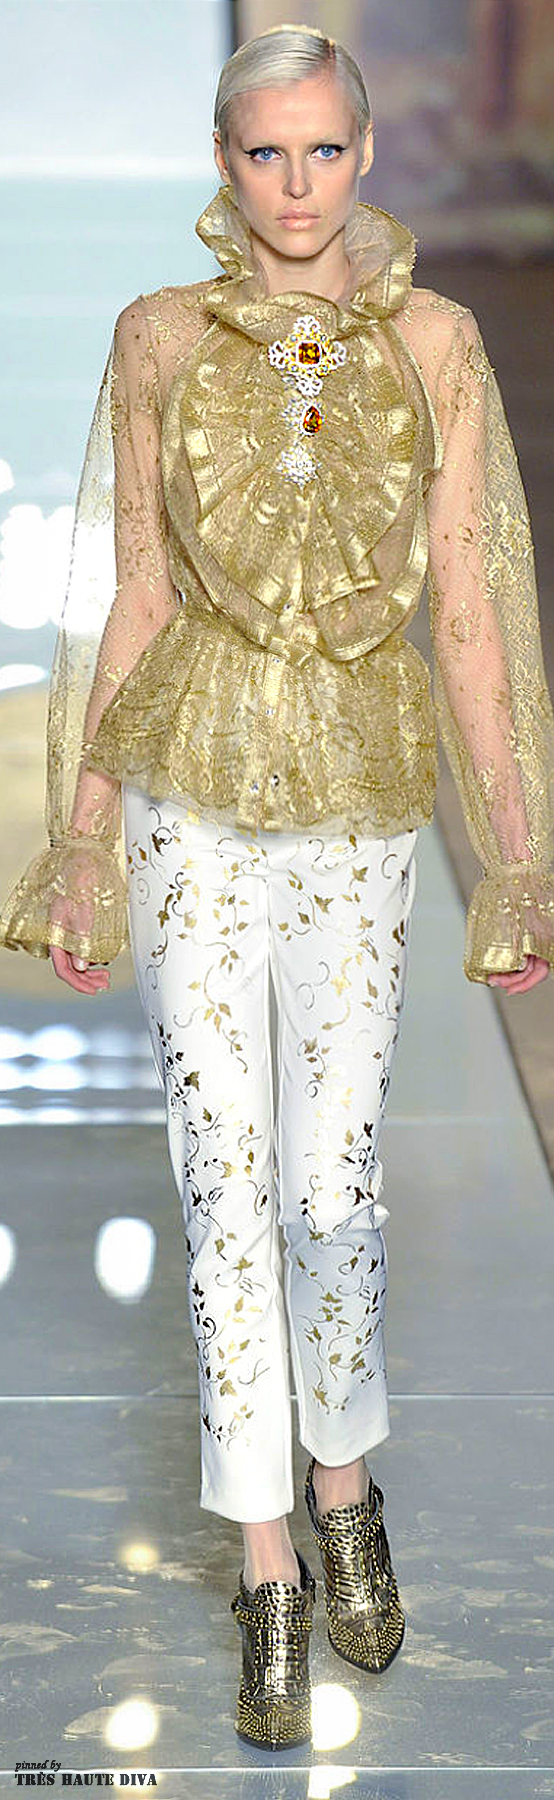 Roccobarocco fallwinter the house of beccaria fashion